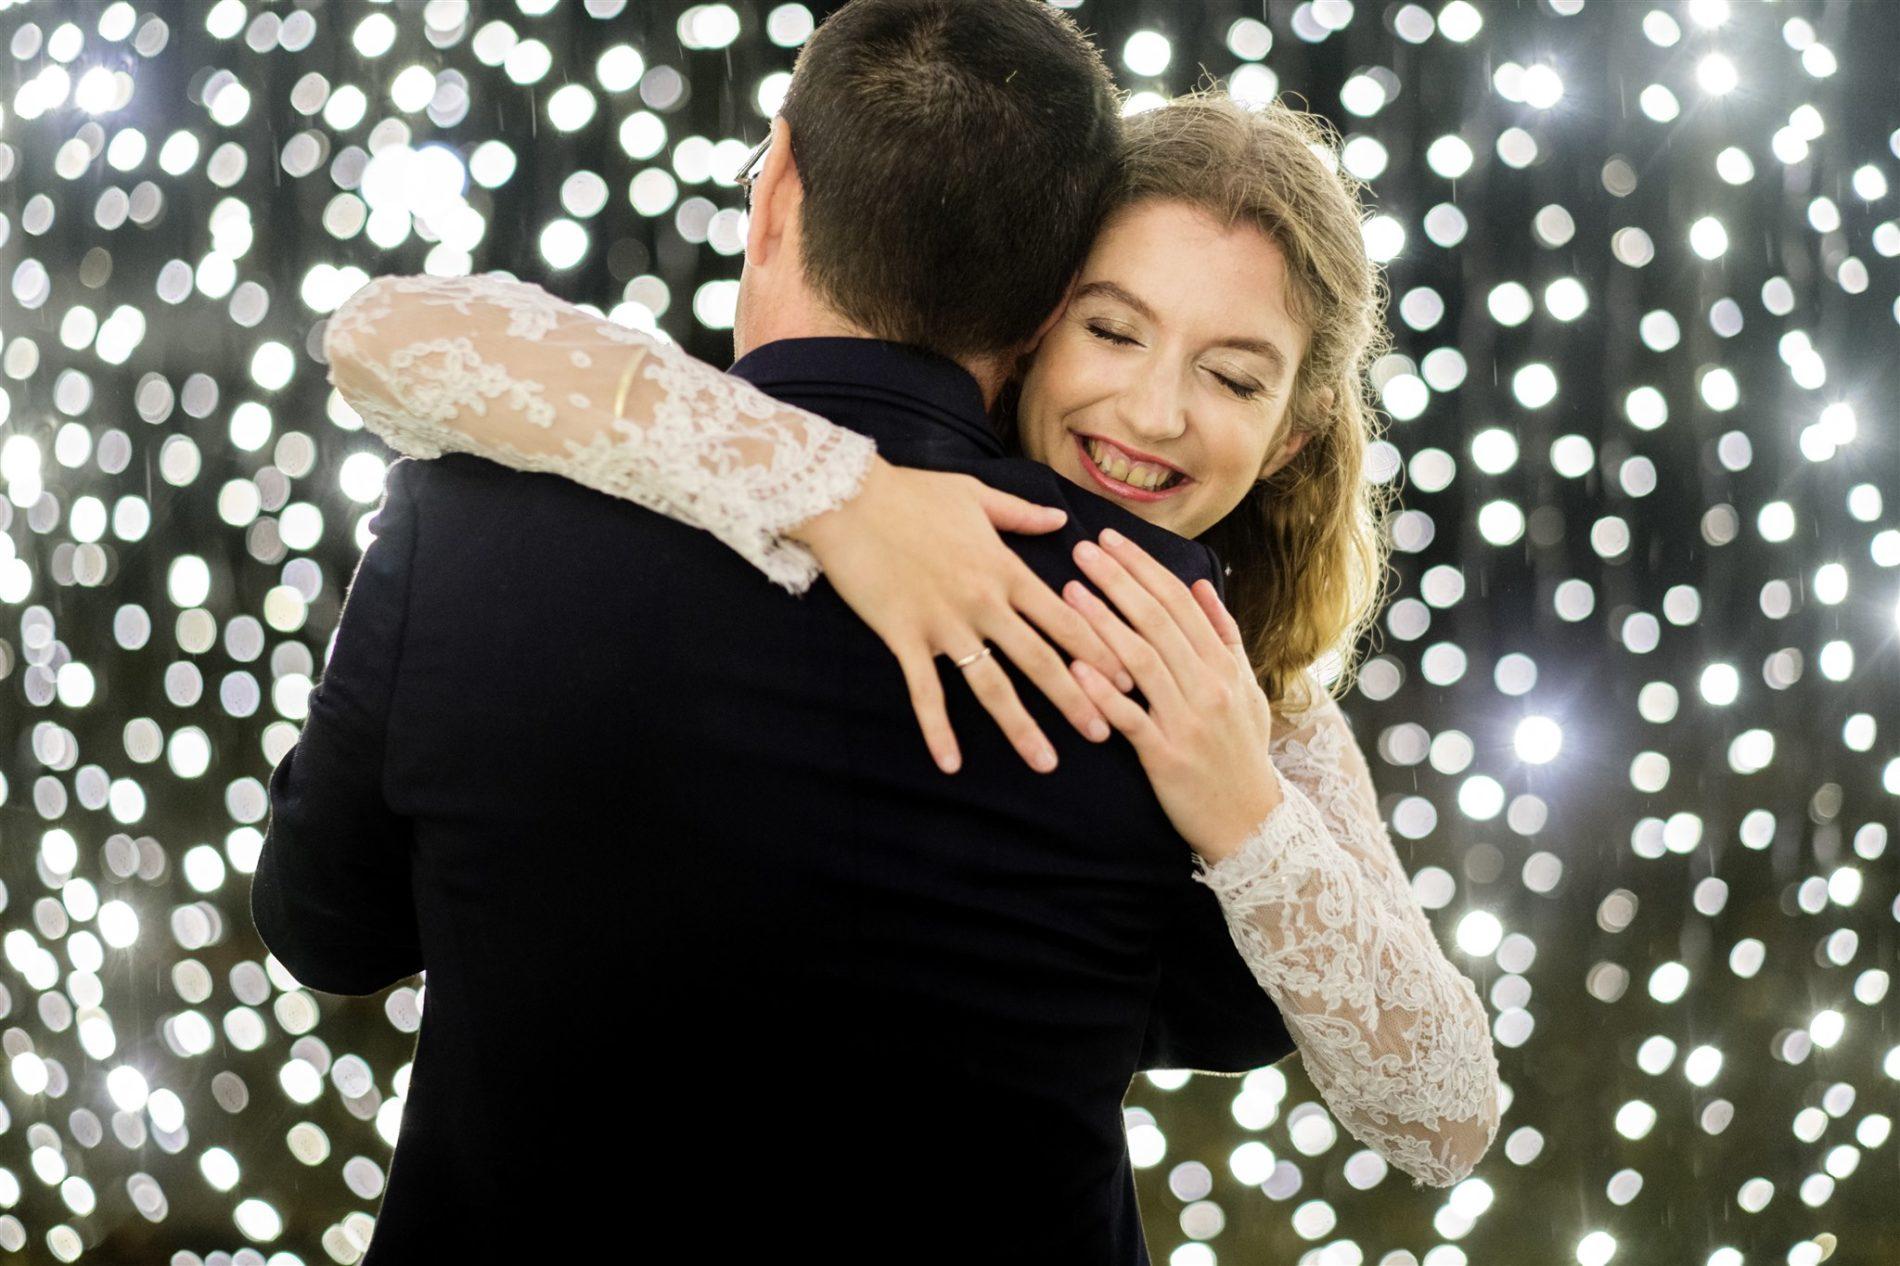 tendre mariage photographe bordeaux